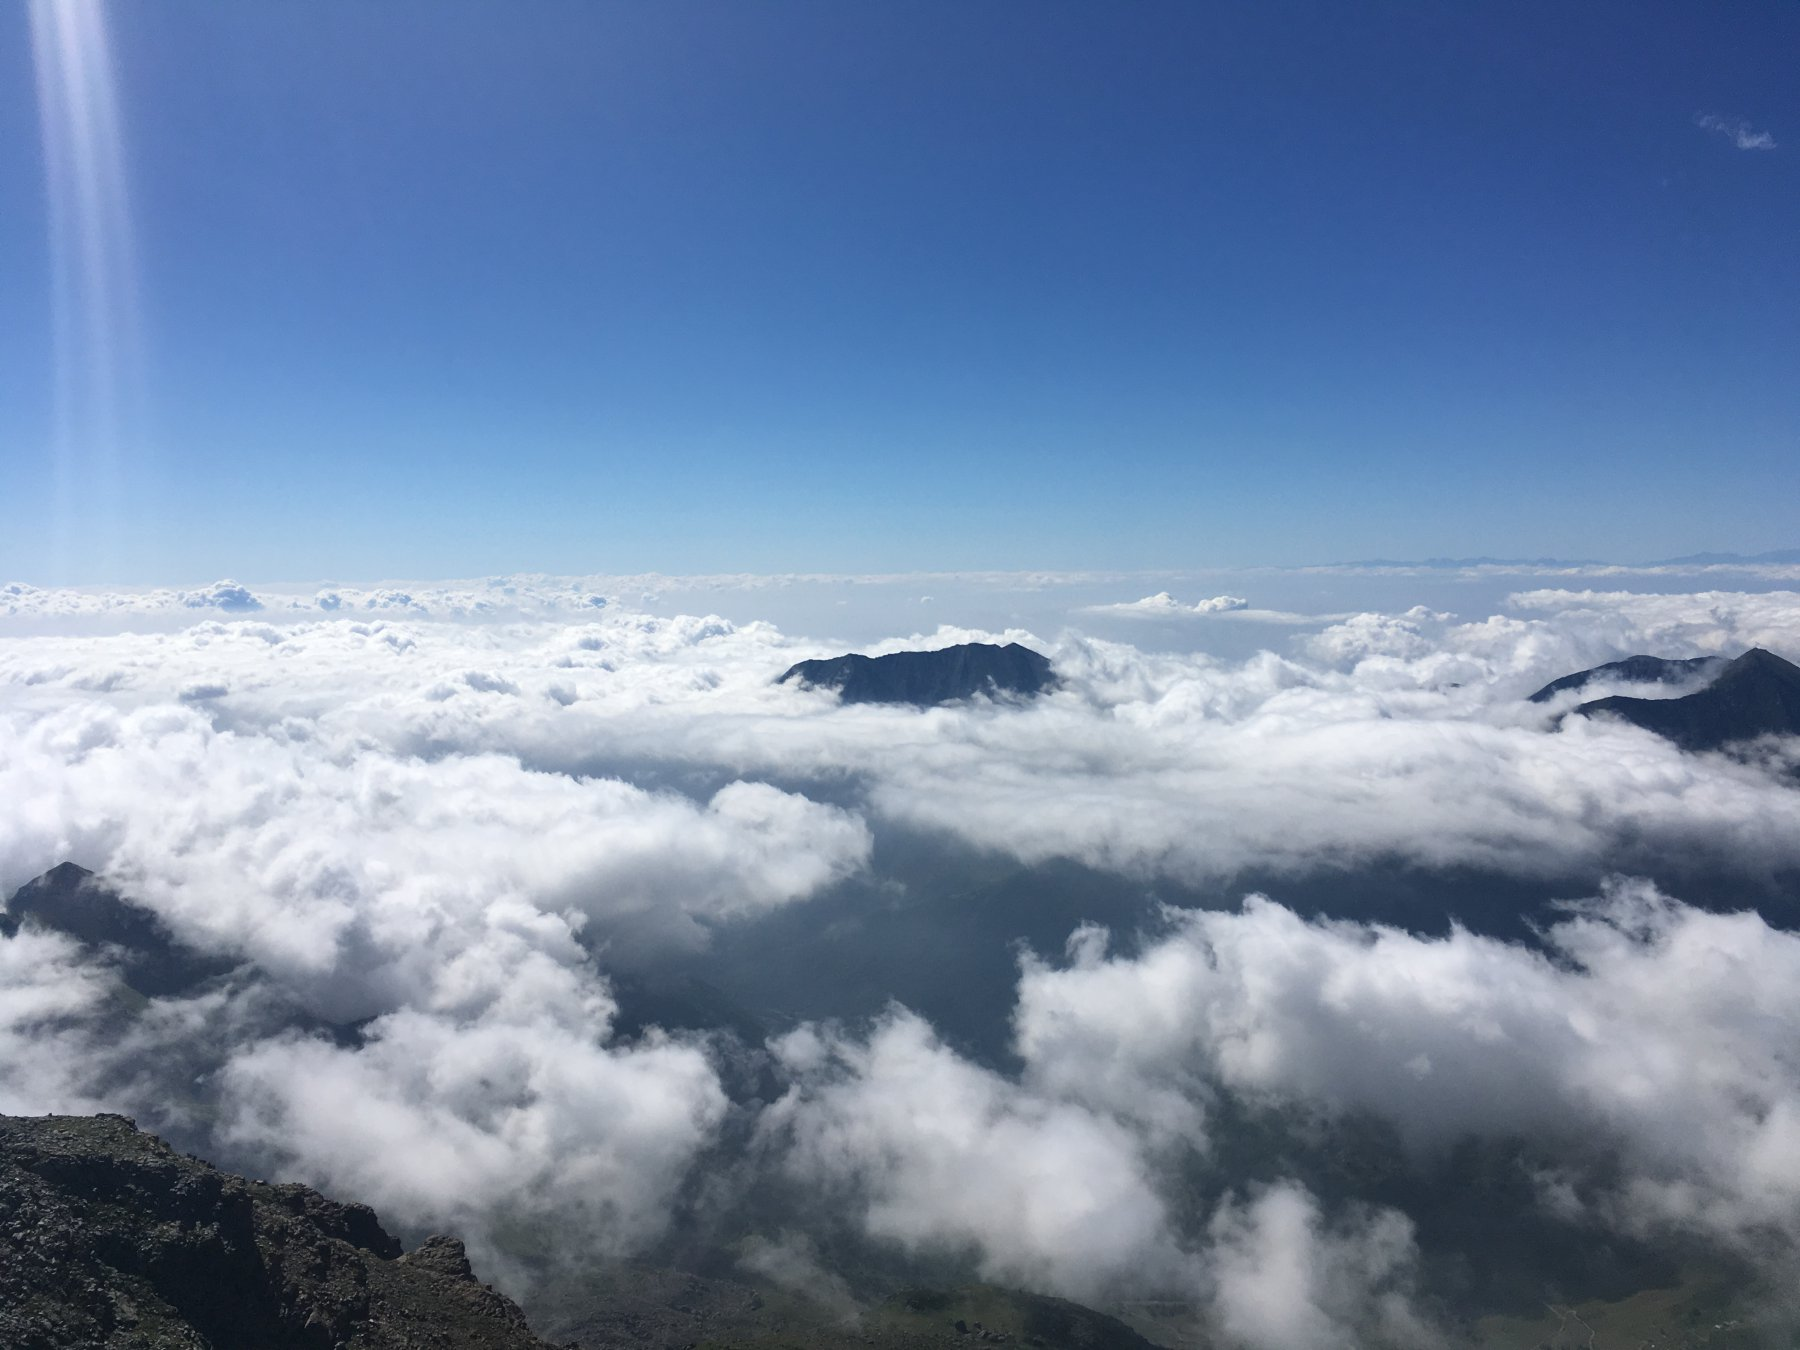 Il Civrari spunta fra le nuvole